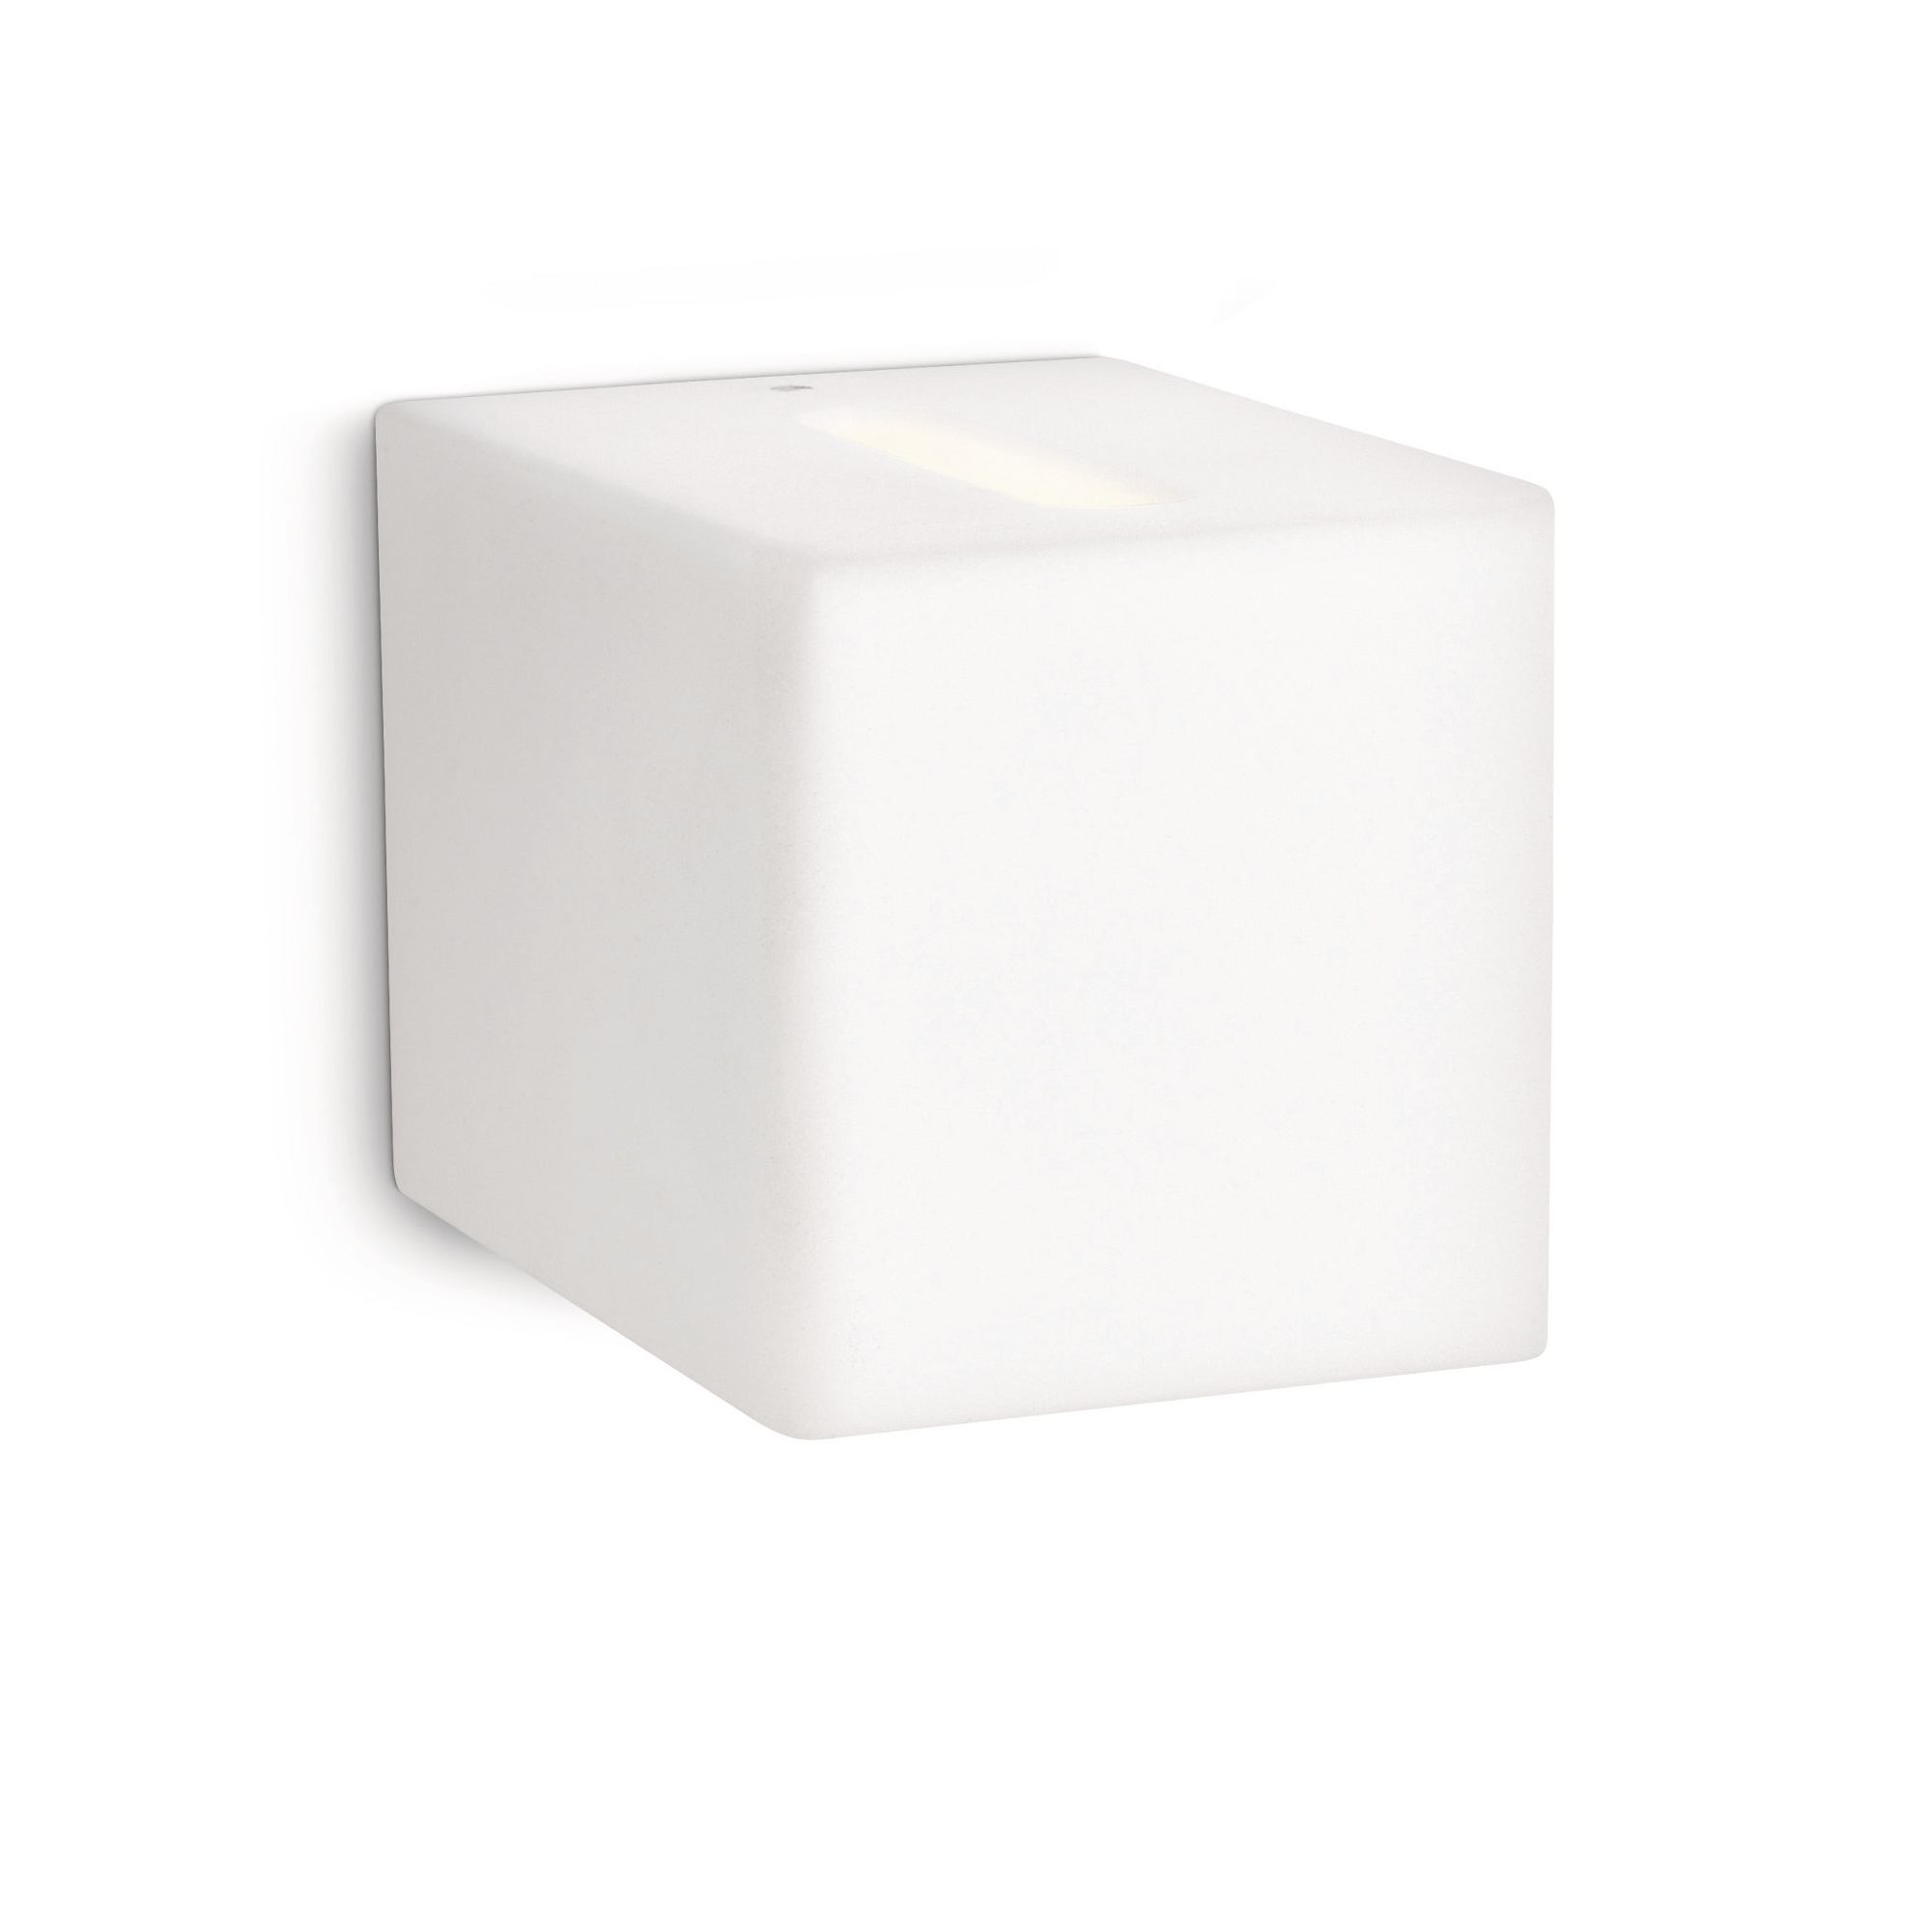 instyle wandleuchte cubo von philips. Black Bedroom Furniture Sets. Home Design Ideas